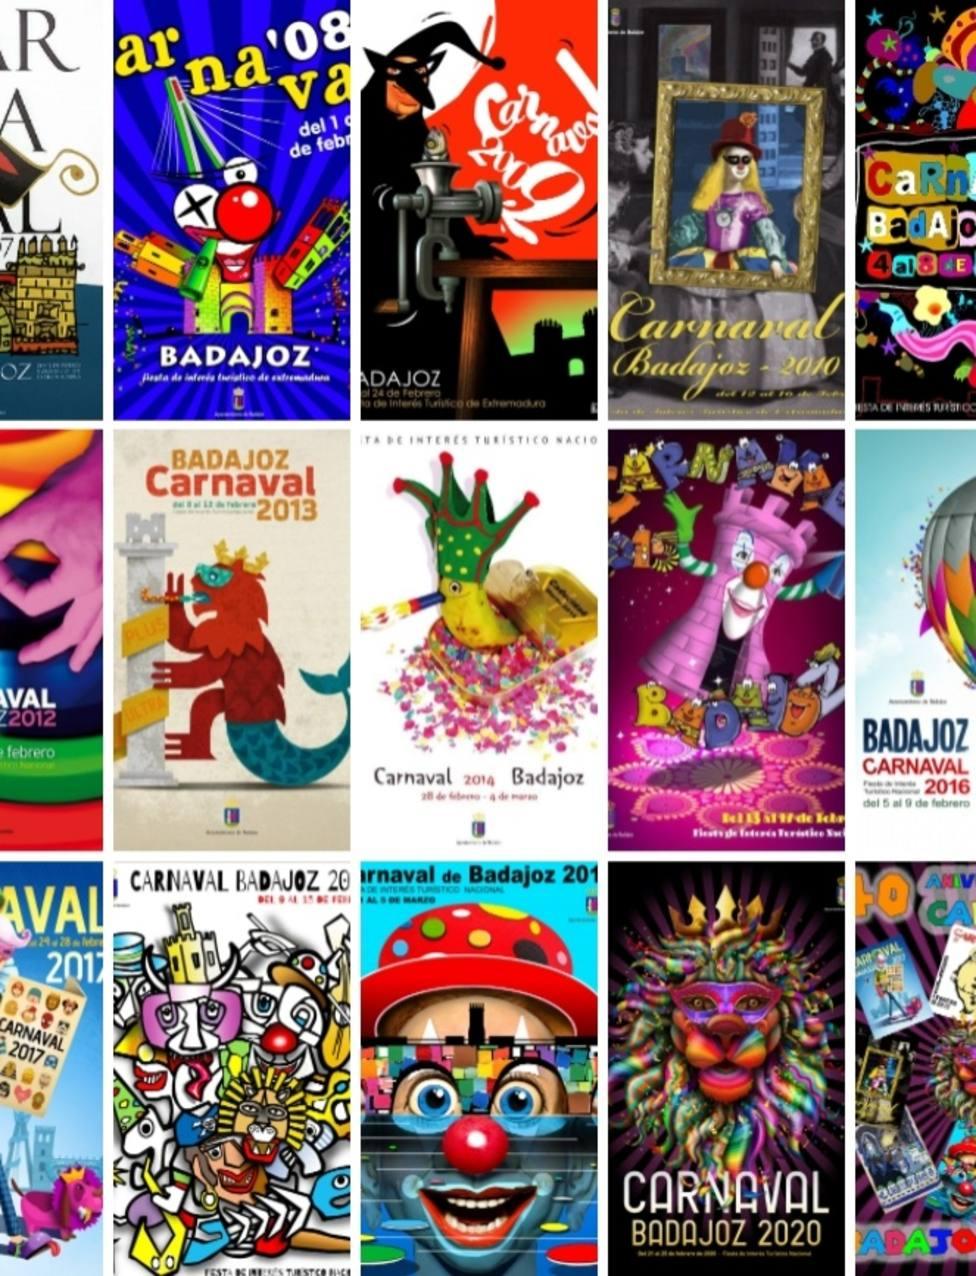 ctv-dss-carteles-carnaval-badajoz